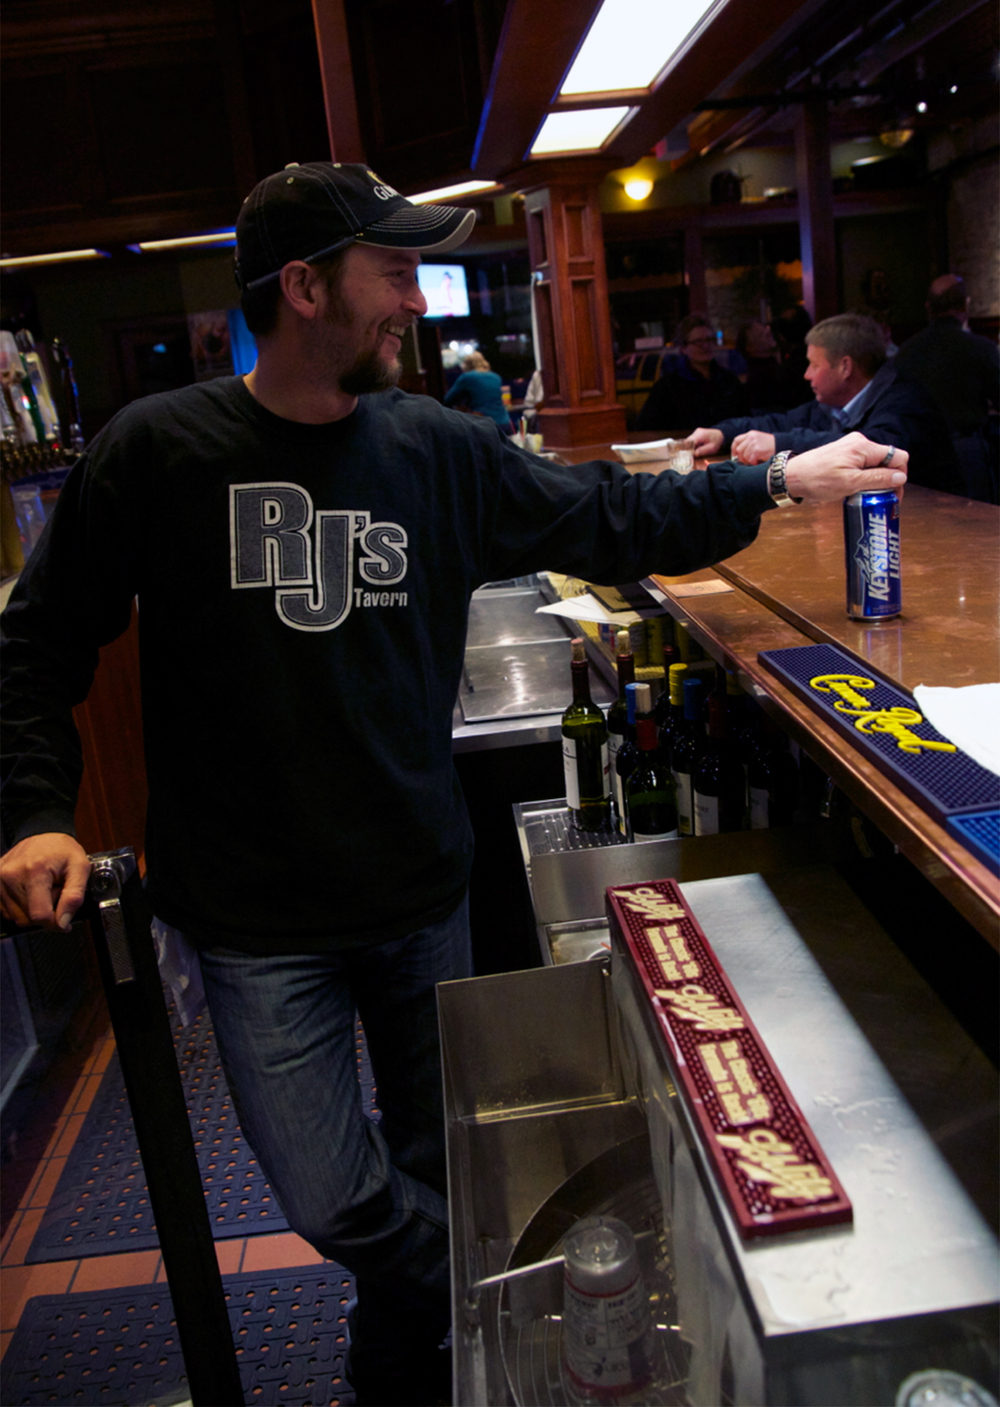 Brad serves up a tasty beverage